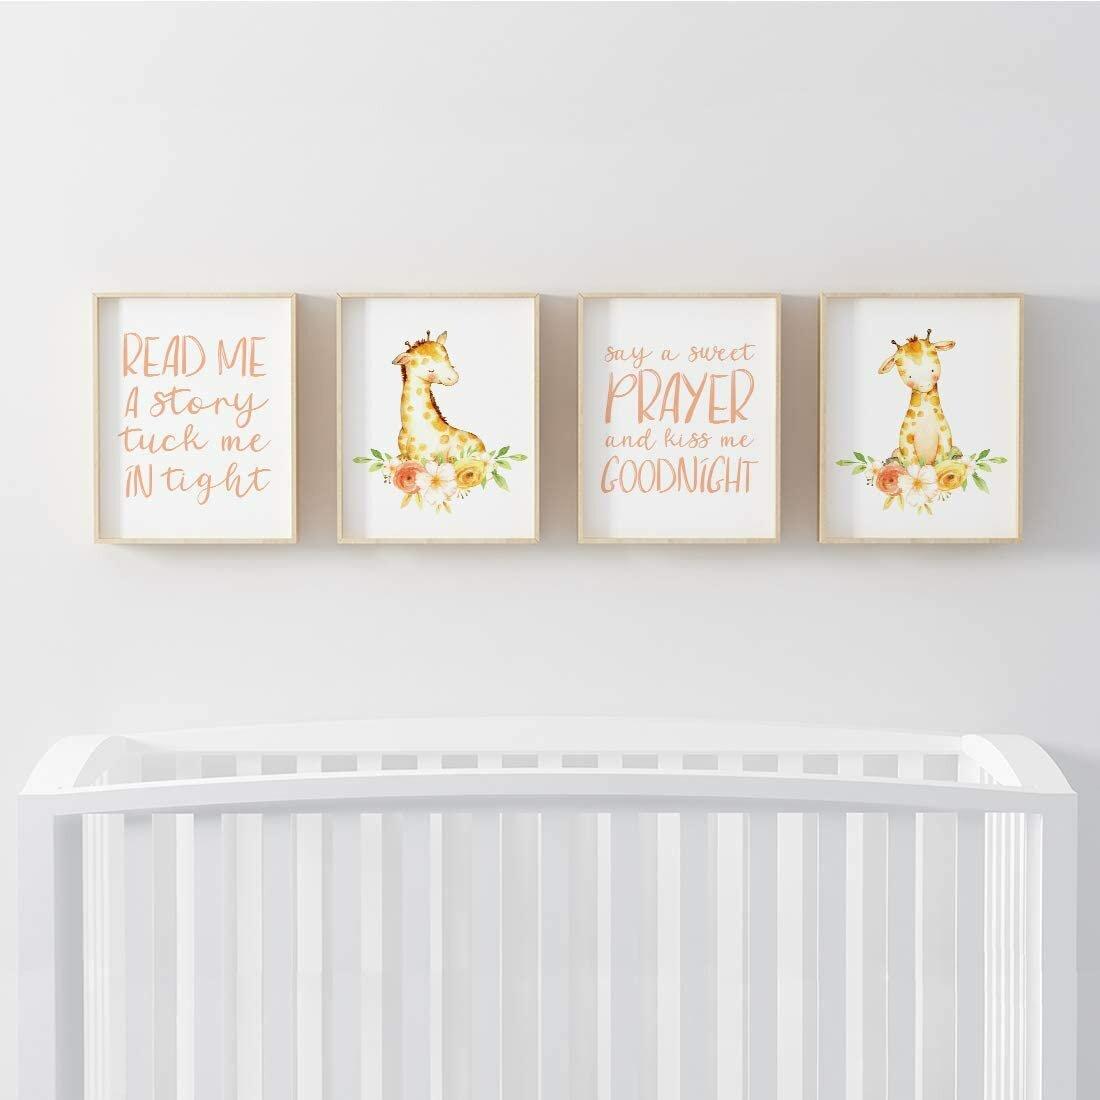 Harriet Bee Nursery Room Wall Art Read Me A Storey Tuck Me In Tight Say A Sweet Prayer Kiss Me Goodnight Girl Giraffe Wayfair Ca